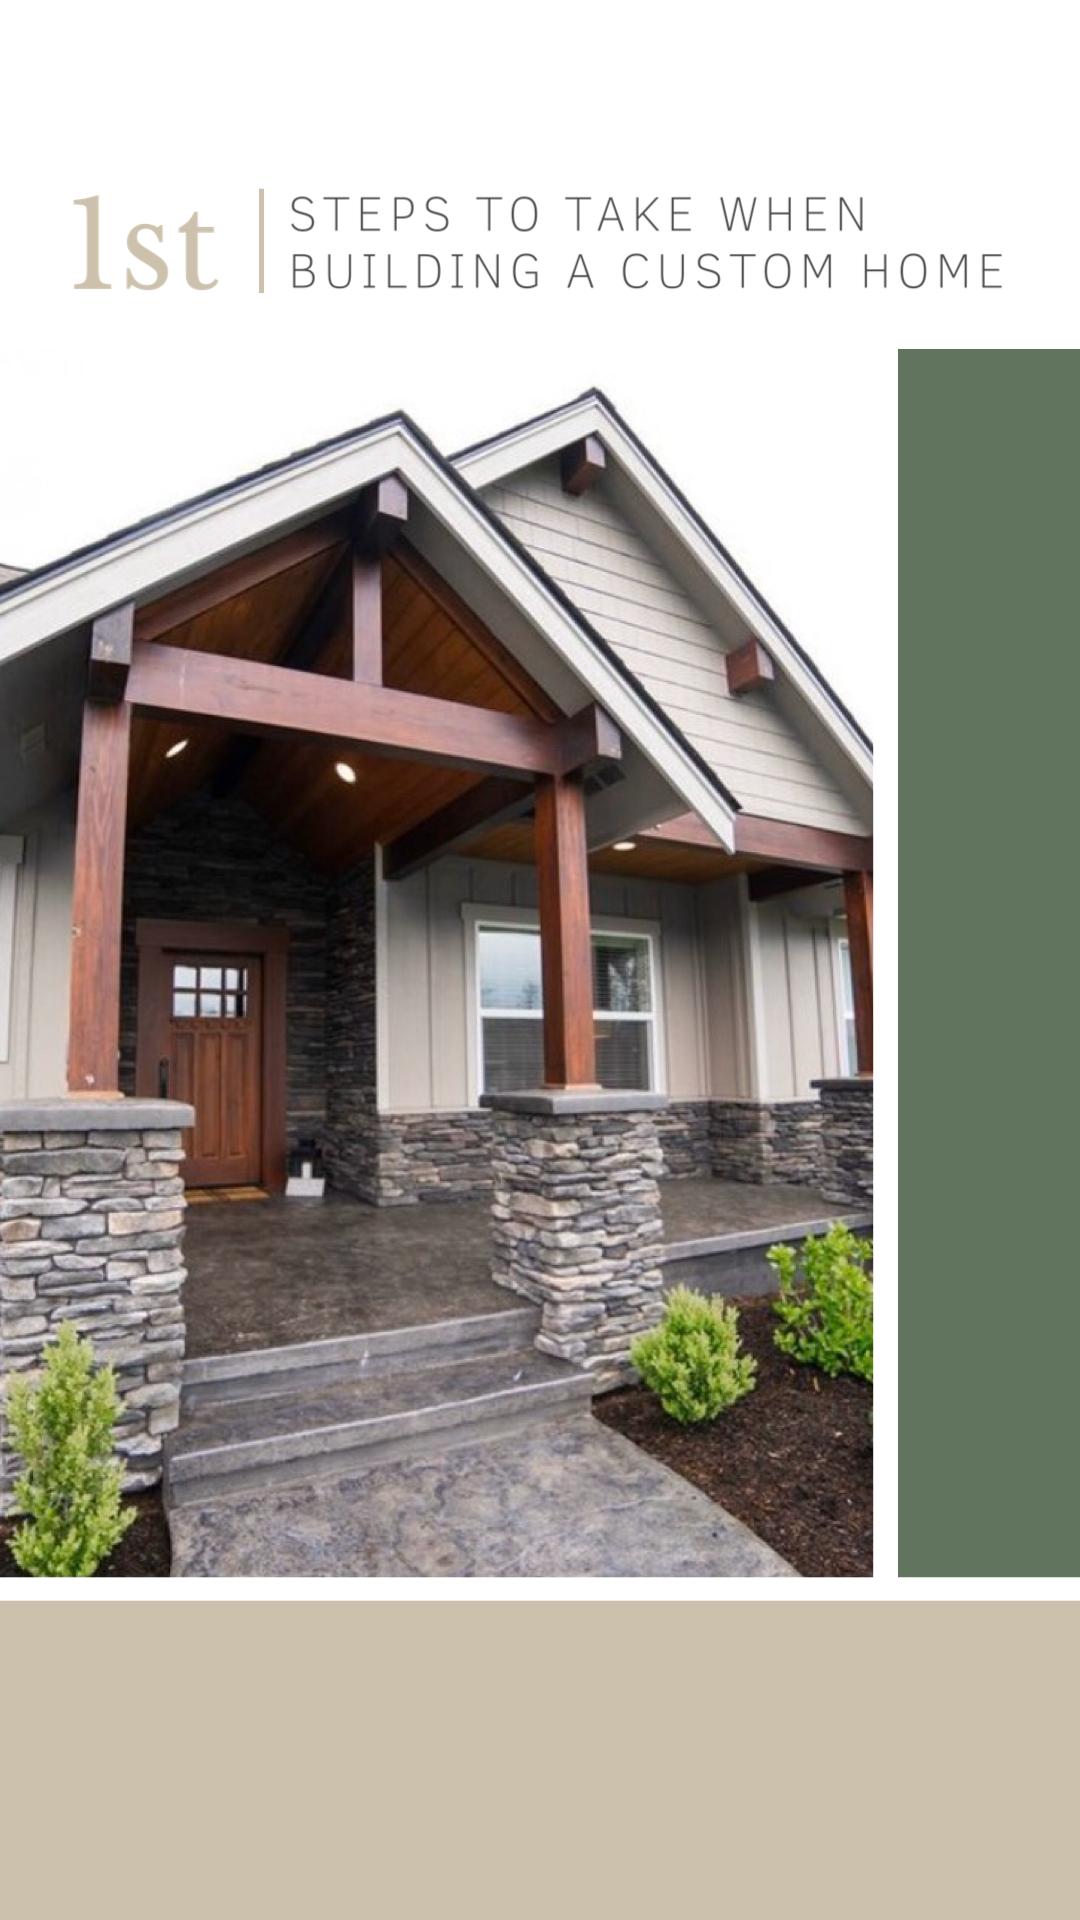 Tips and tricks for building a custom home. New home build hacks. #newconstruction #homebuyingtips #homebuilding #newbuild #homedesign #homedesignideas #homedesignonabudget #homeupgrades